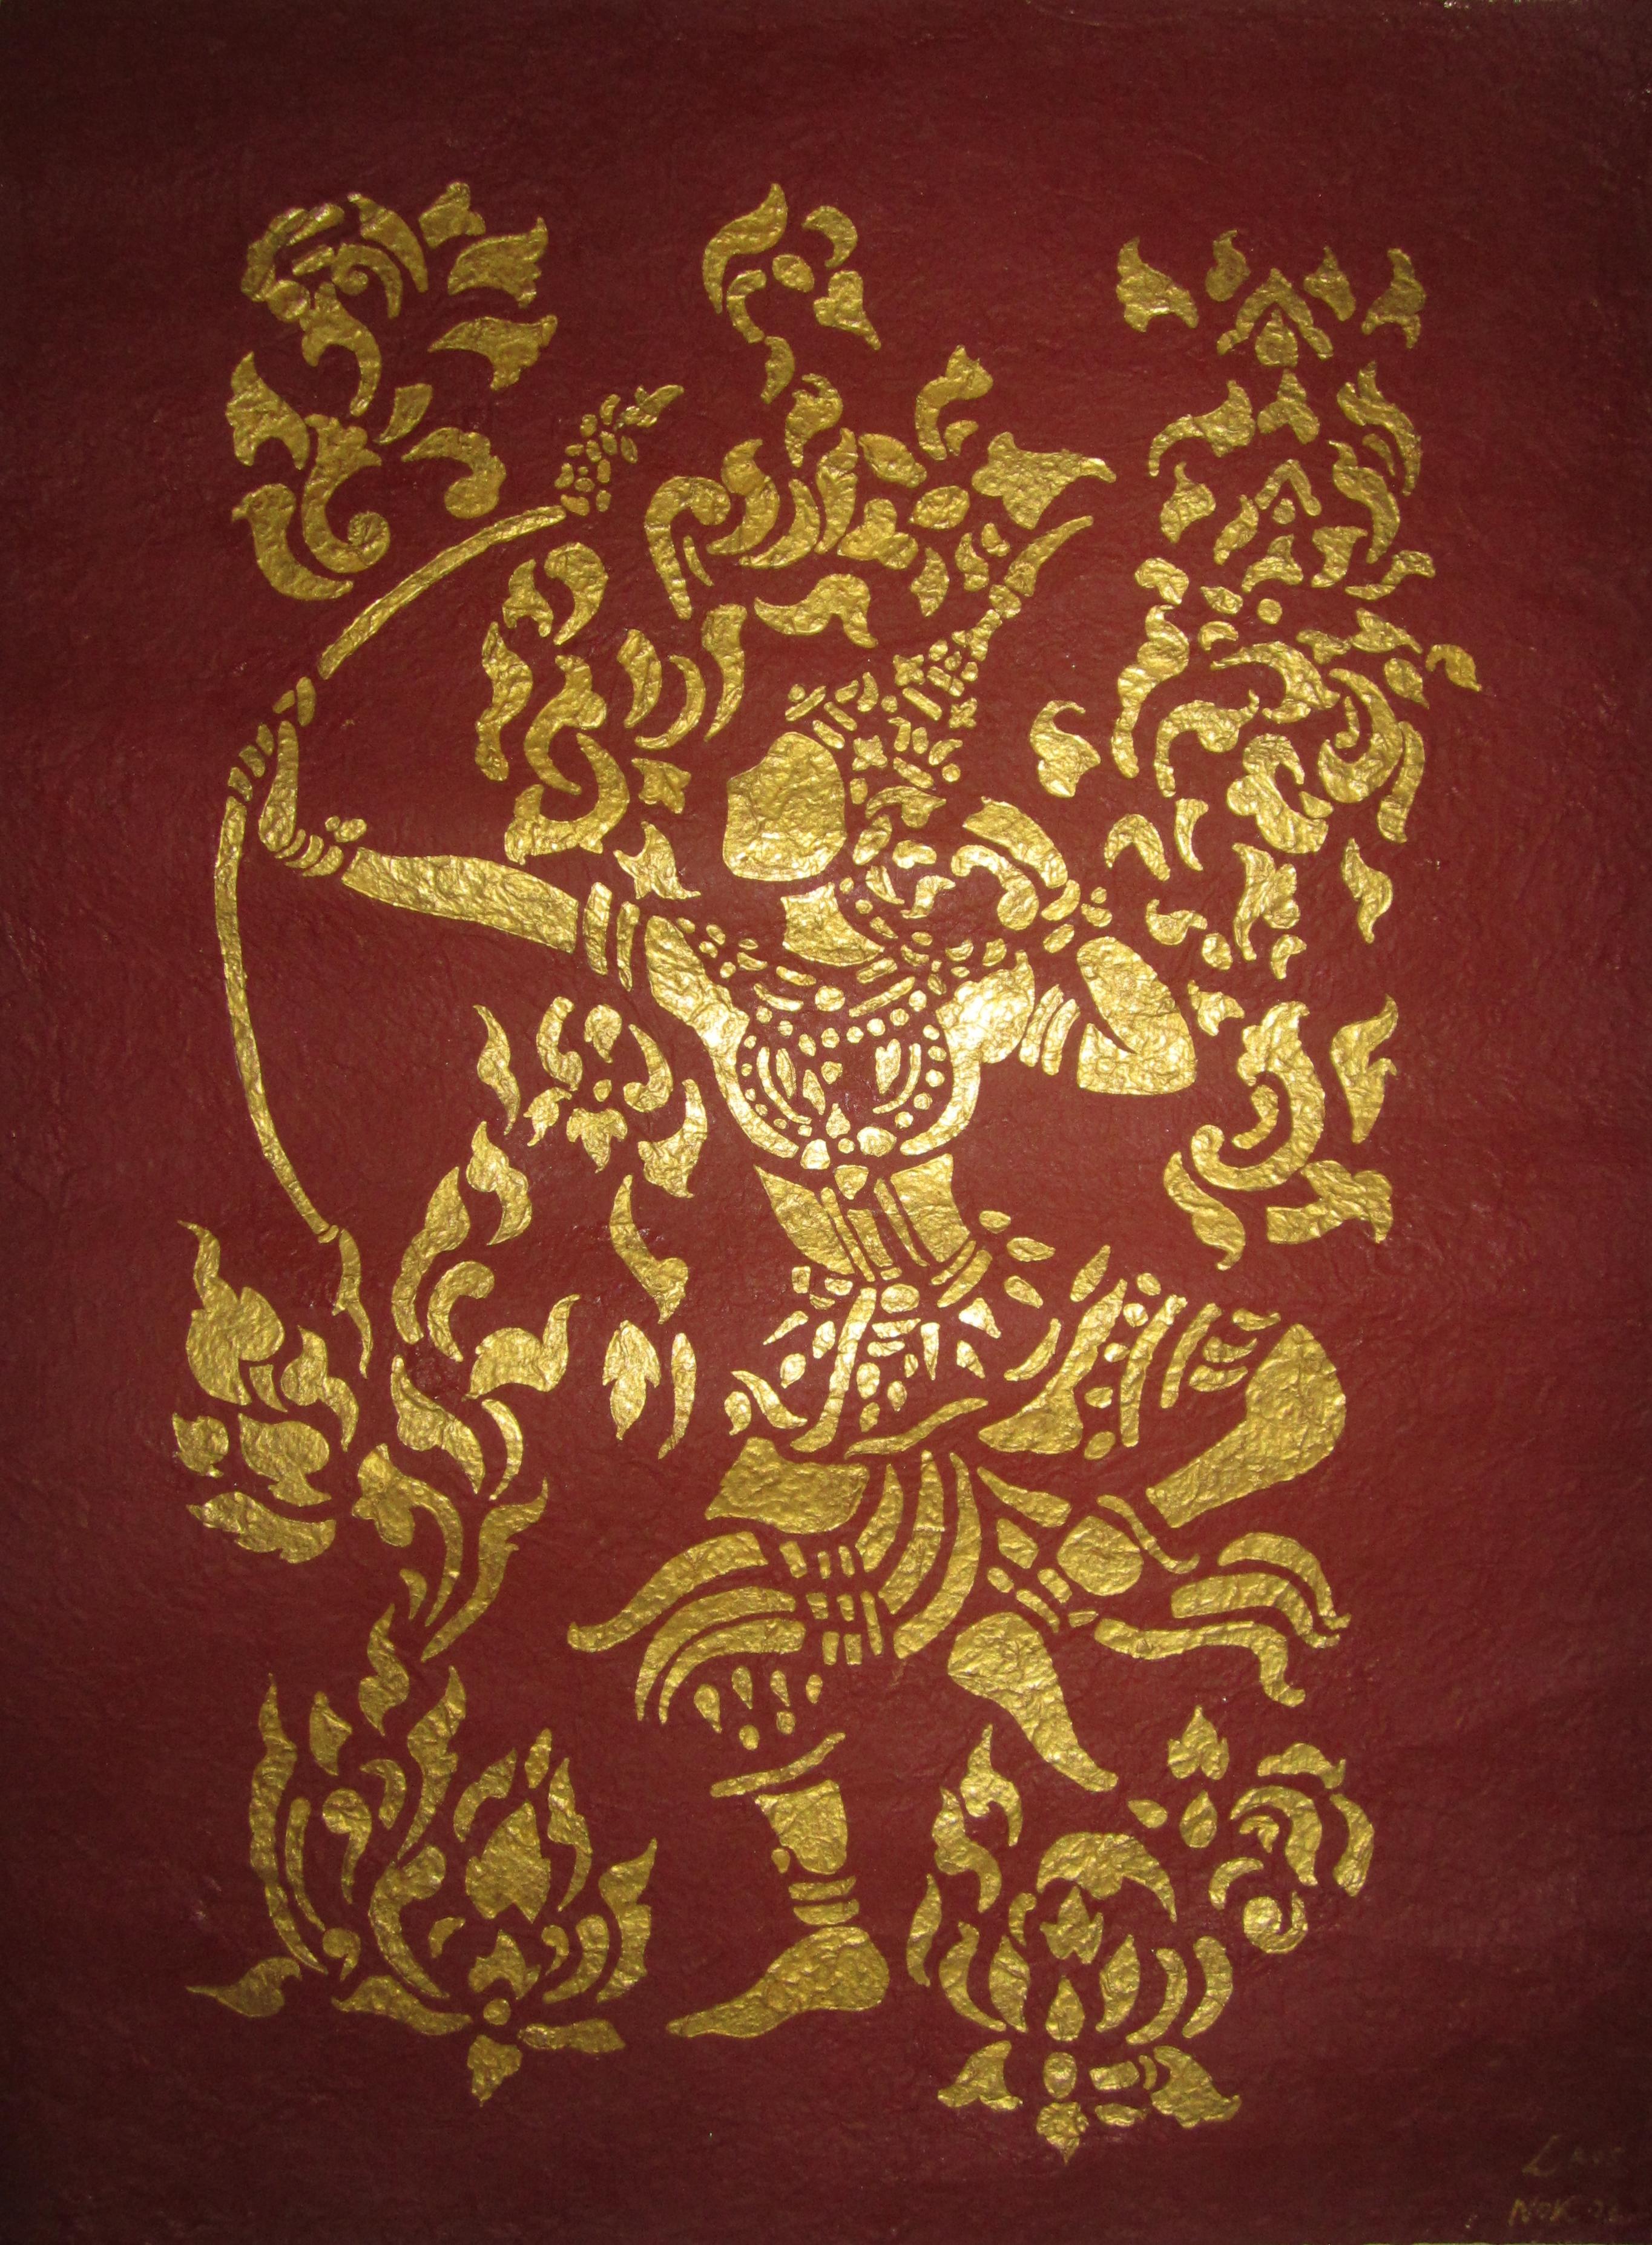 Art Golden Wall Art In Laos The Well Travelled Postcard